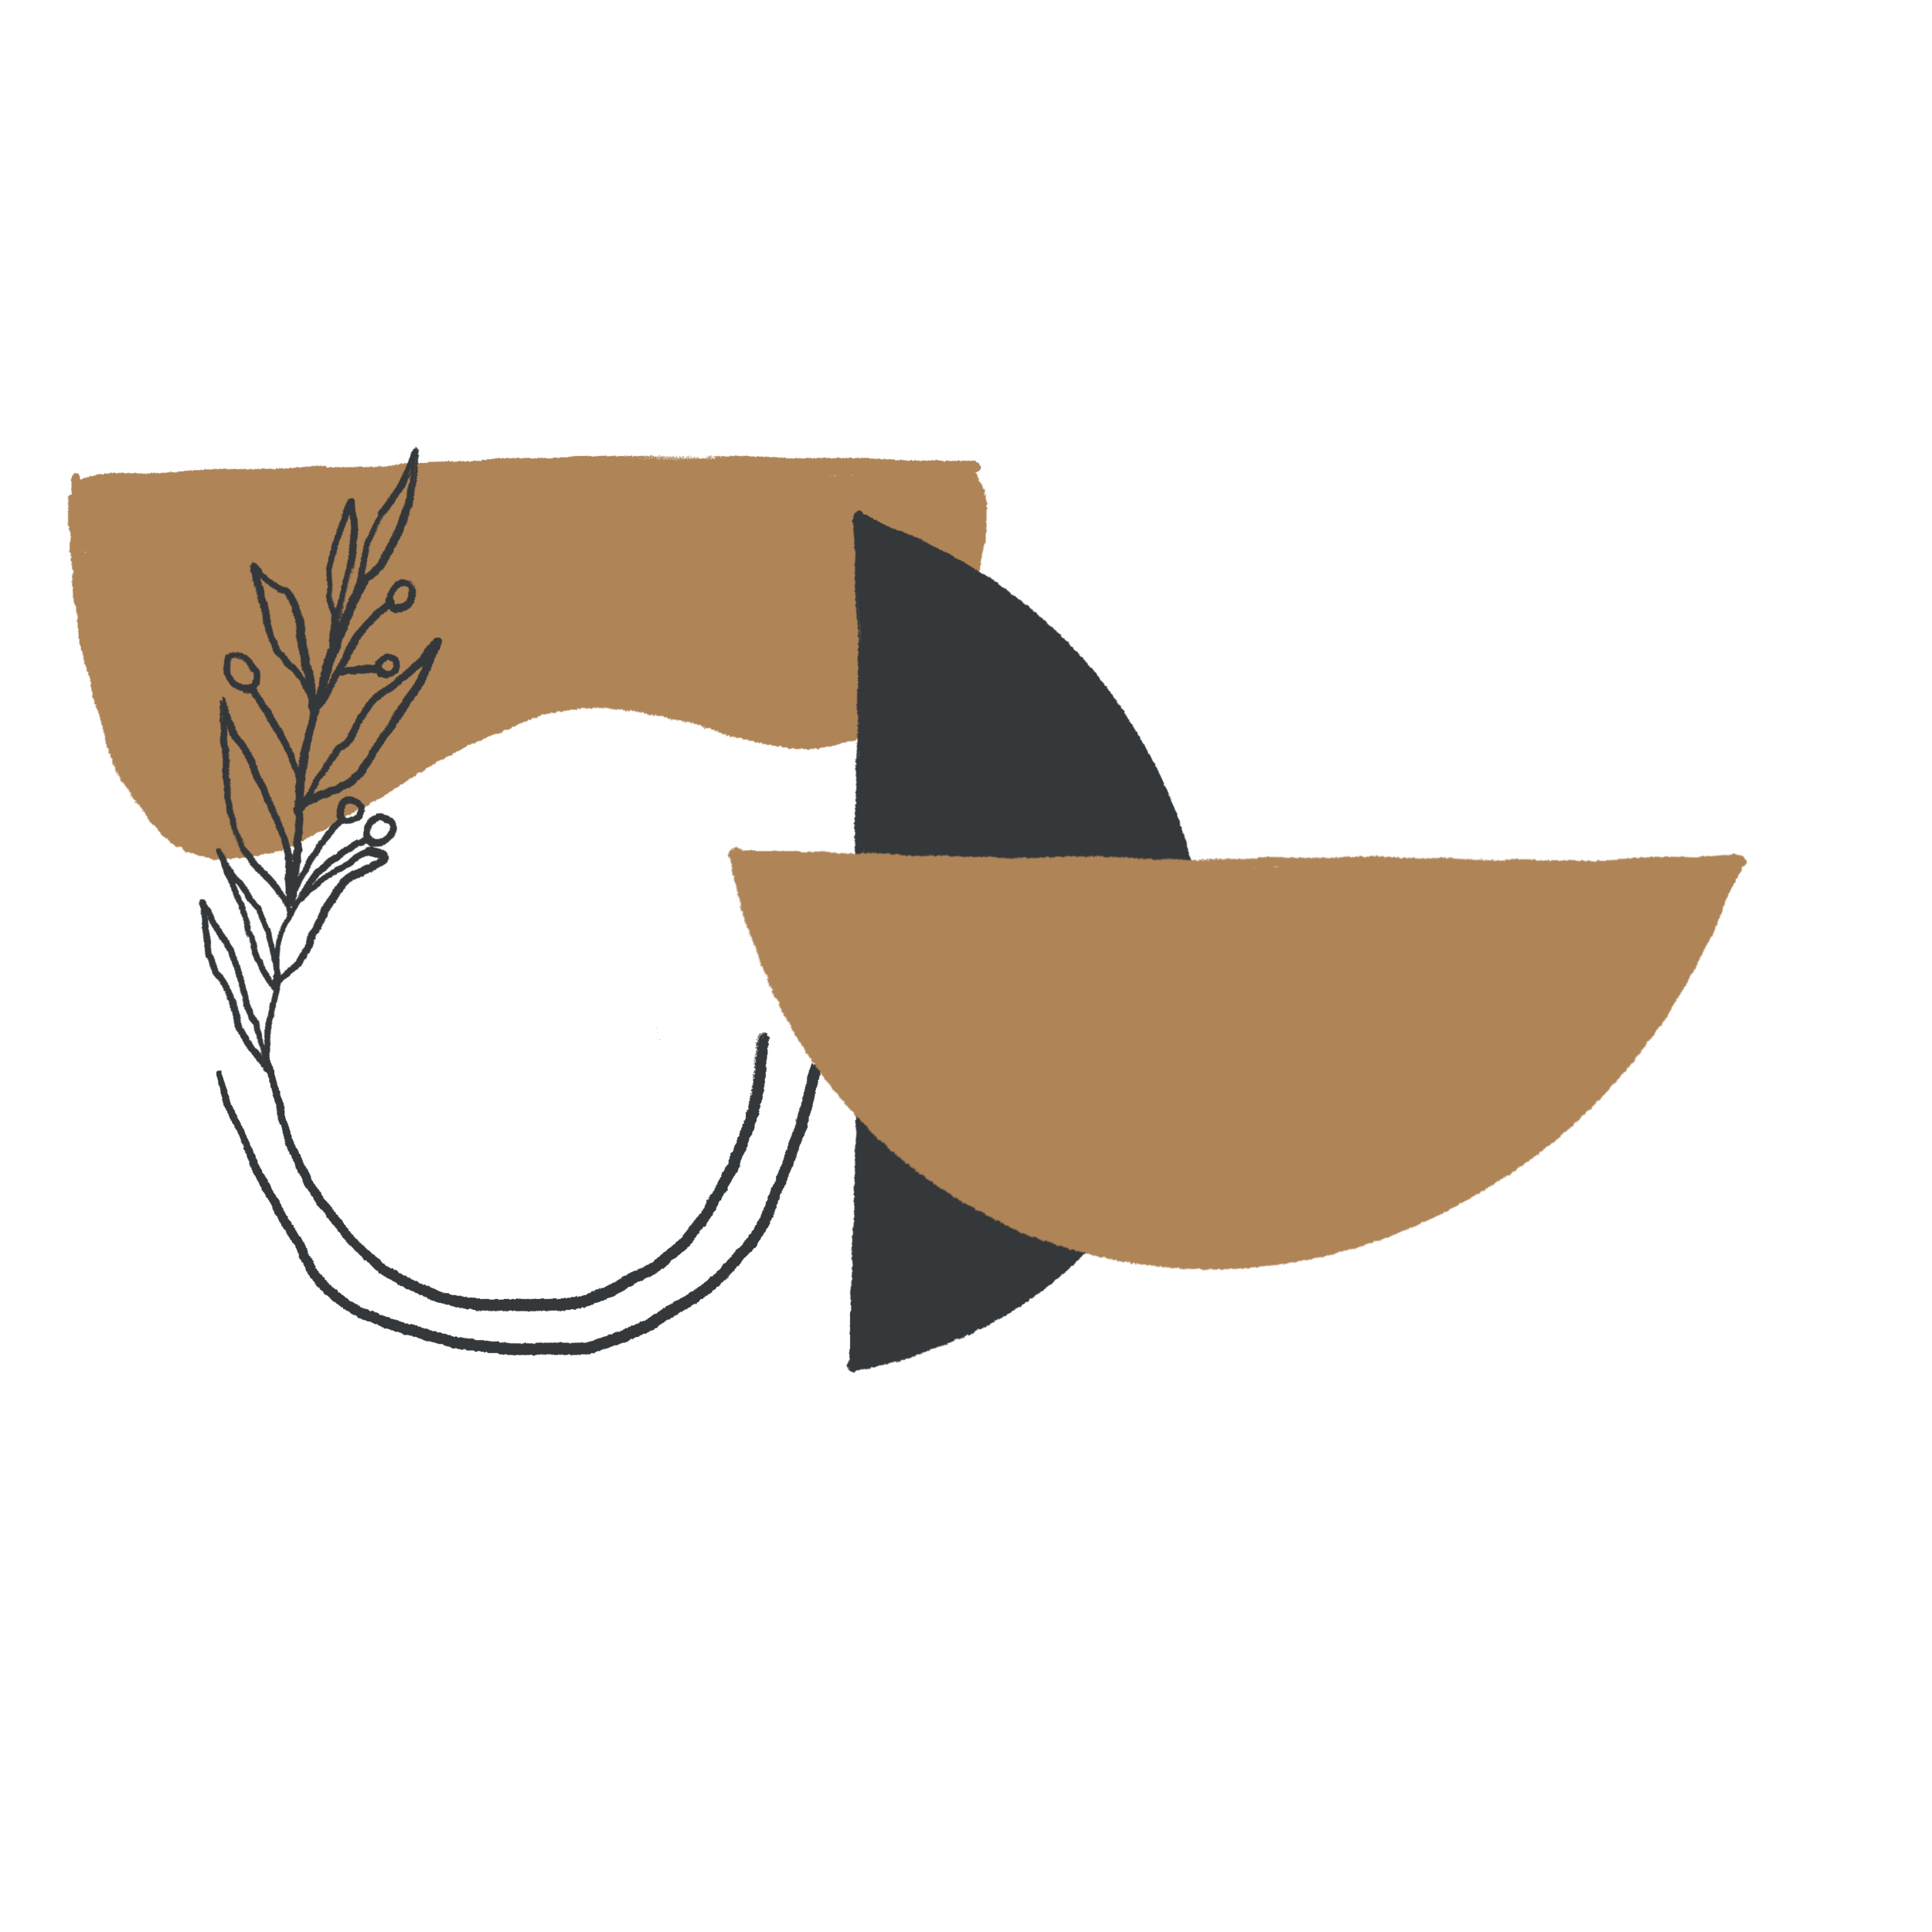 blythe design co